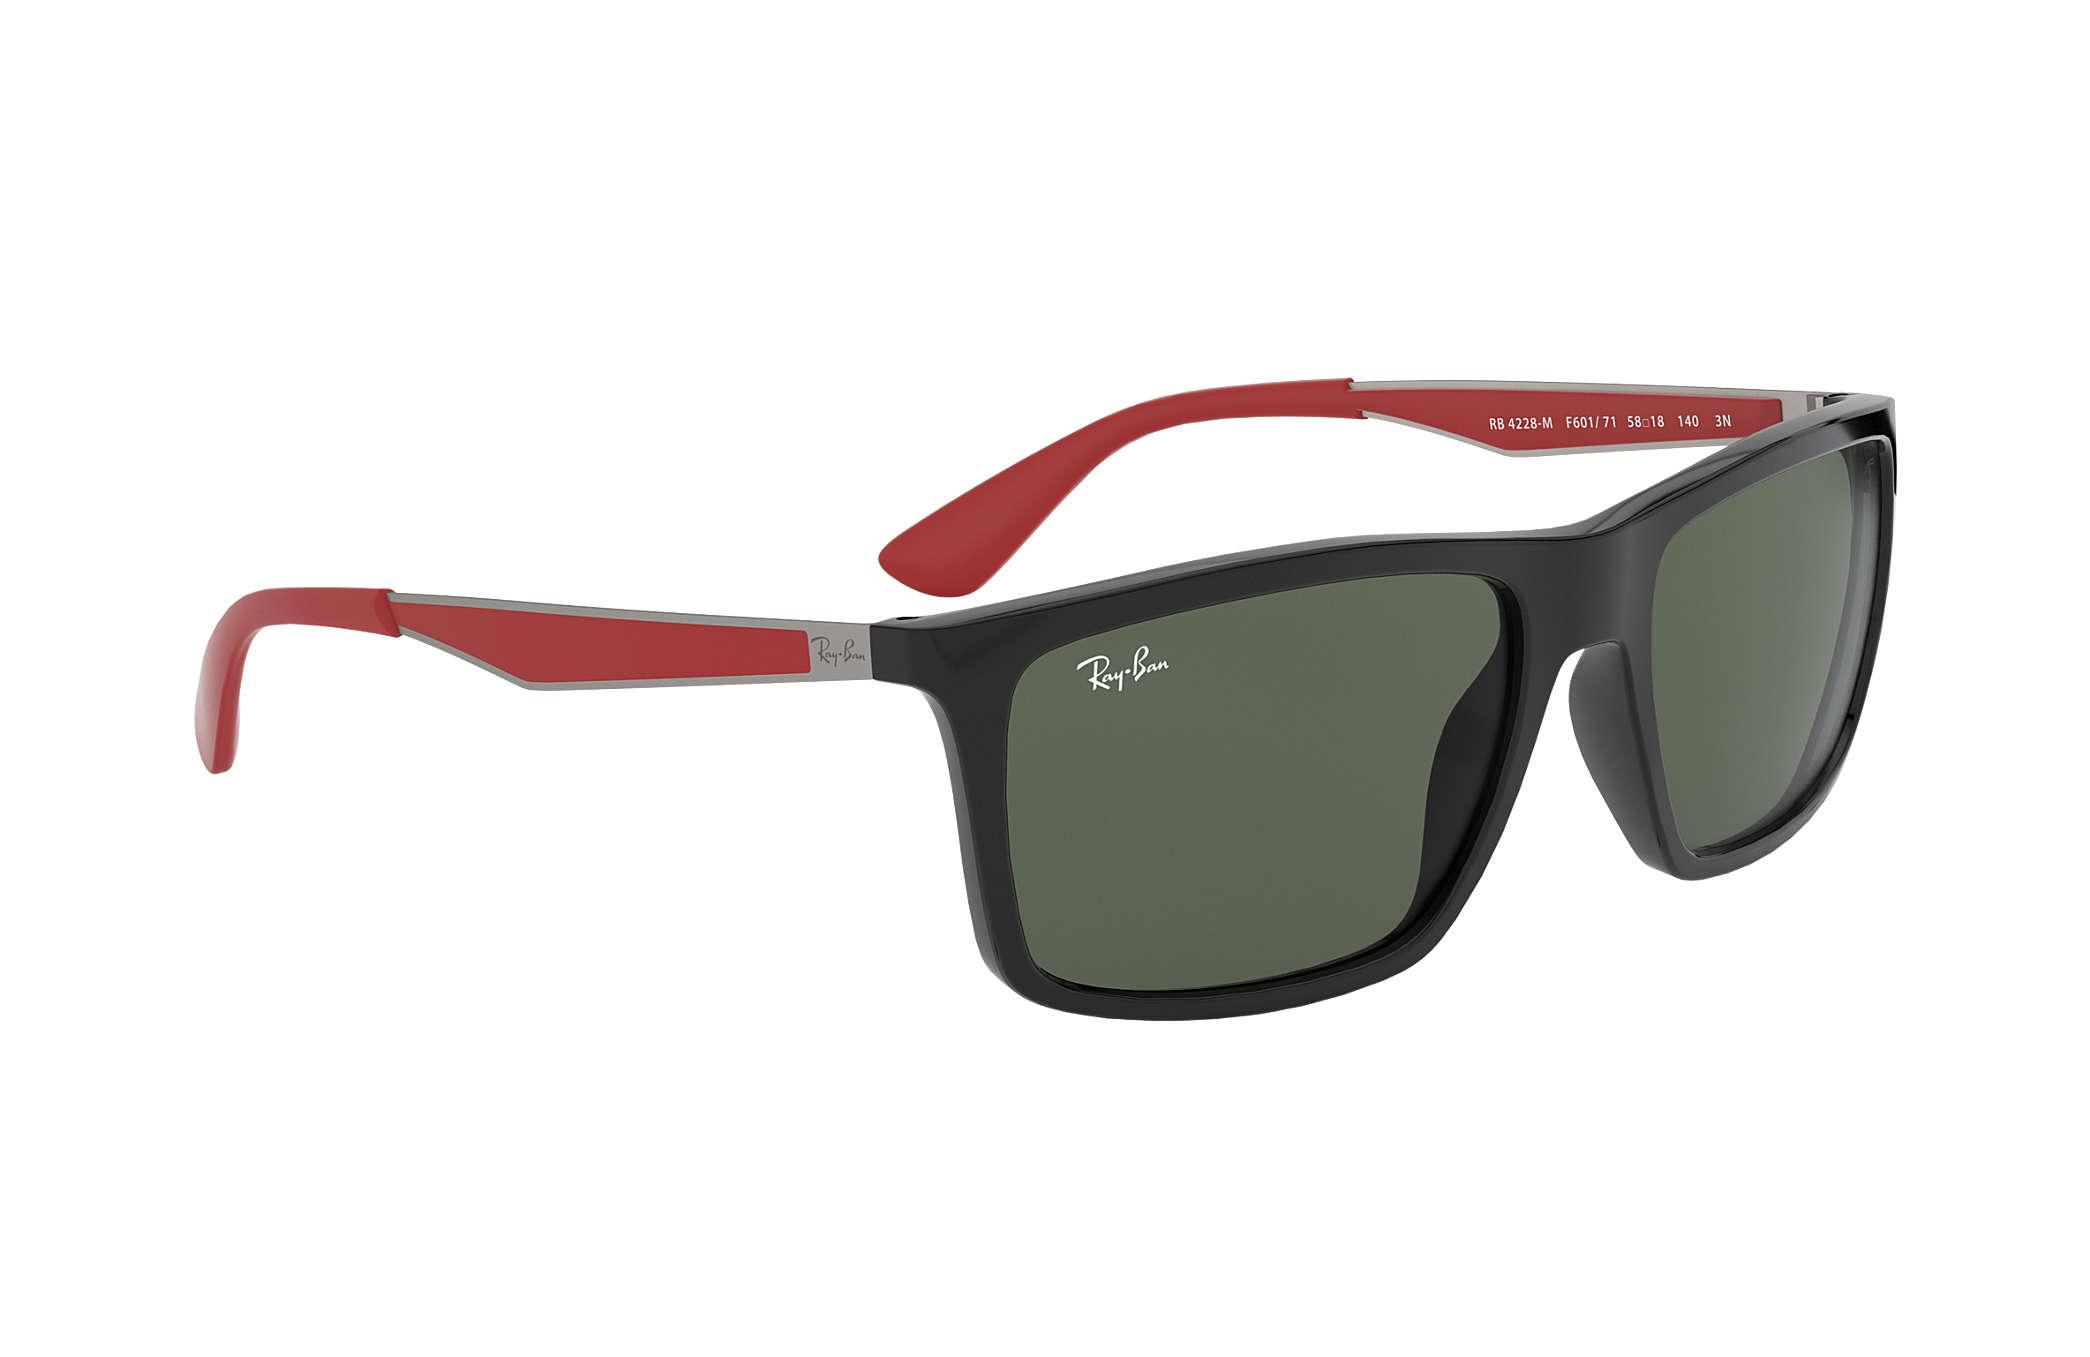 frames ferrari new gla glasses optical italy eyewear eyeglasses products fr vintage rx ggv